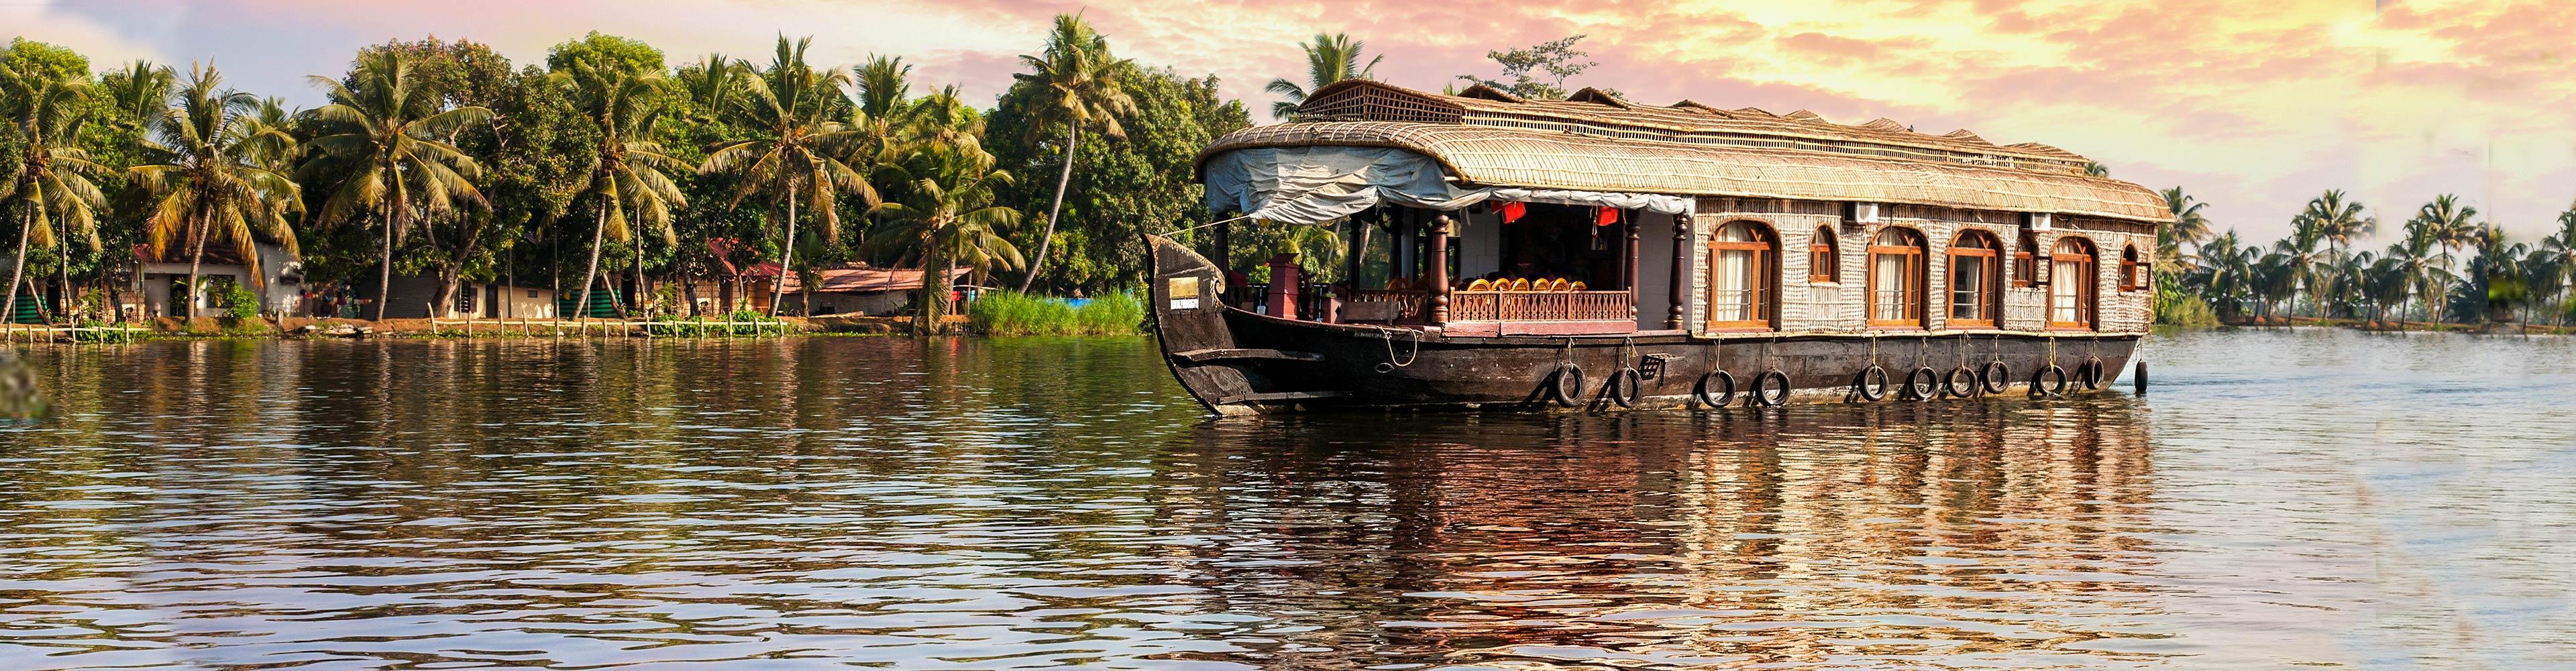 Kerala Highlights